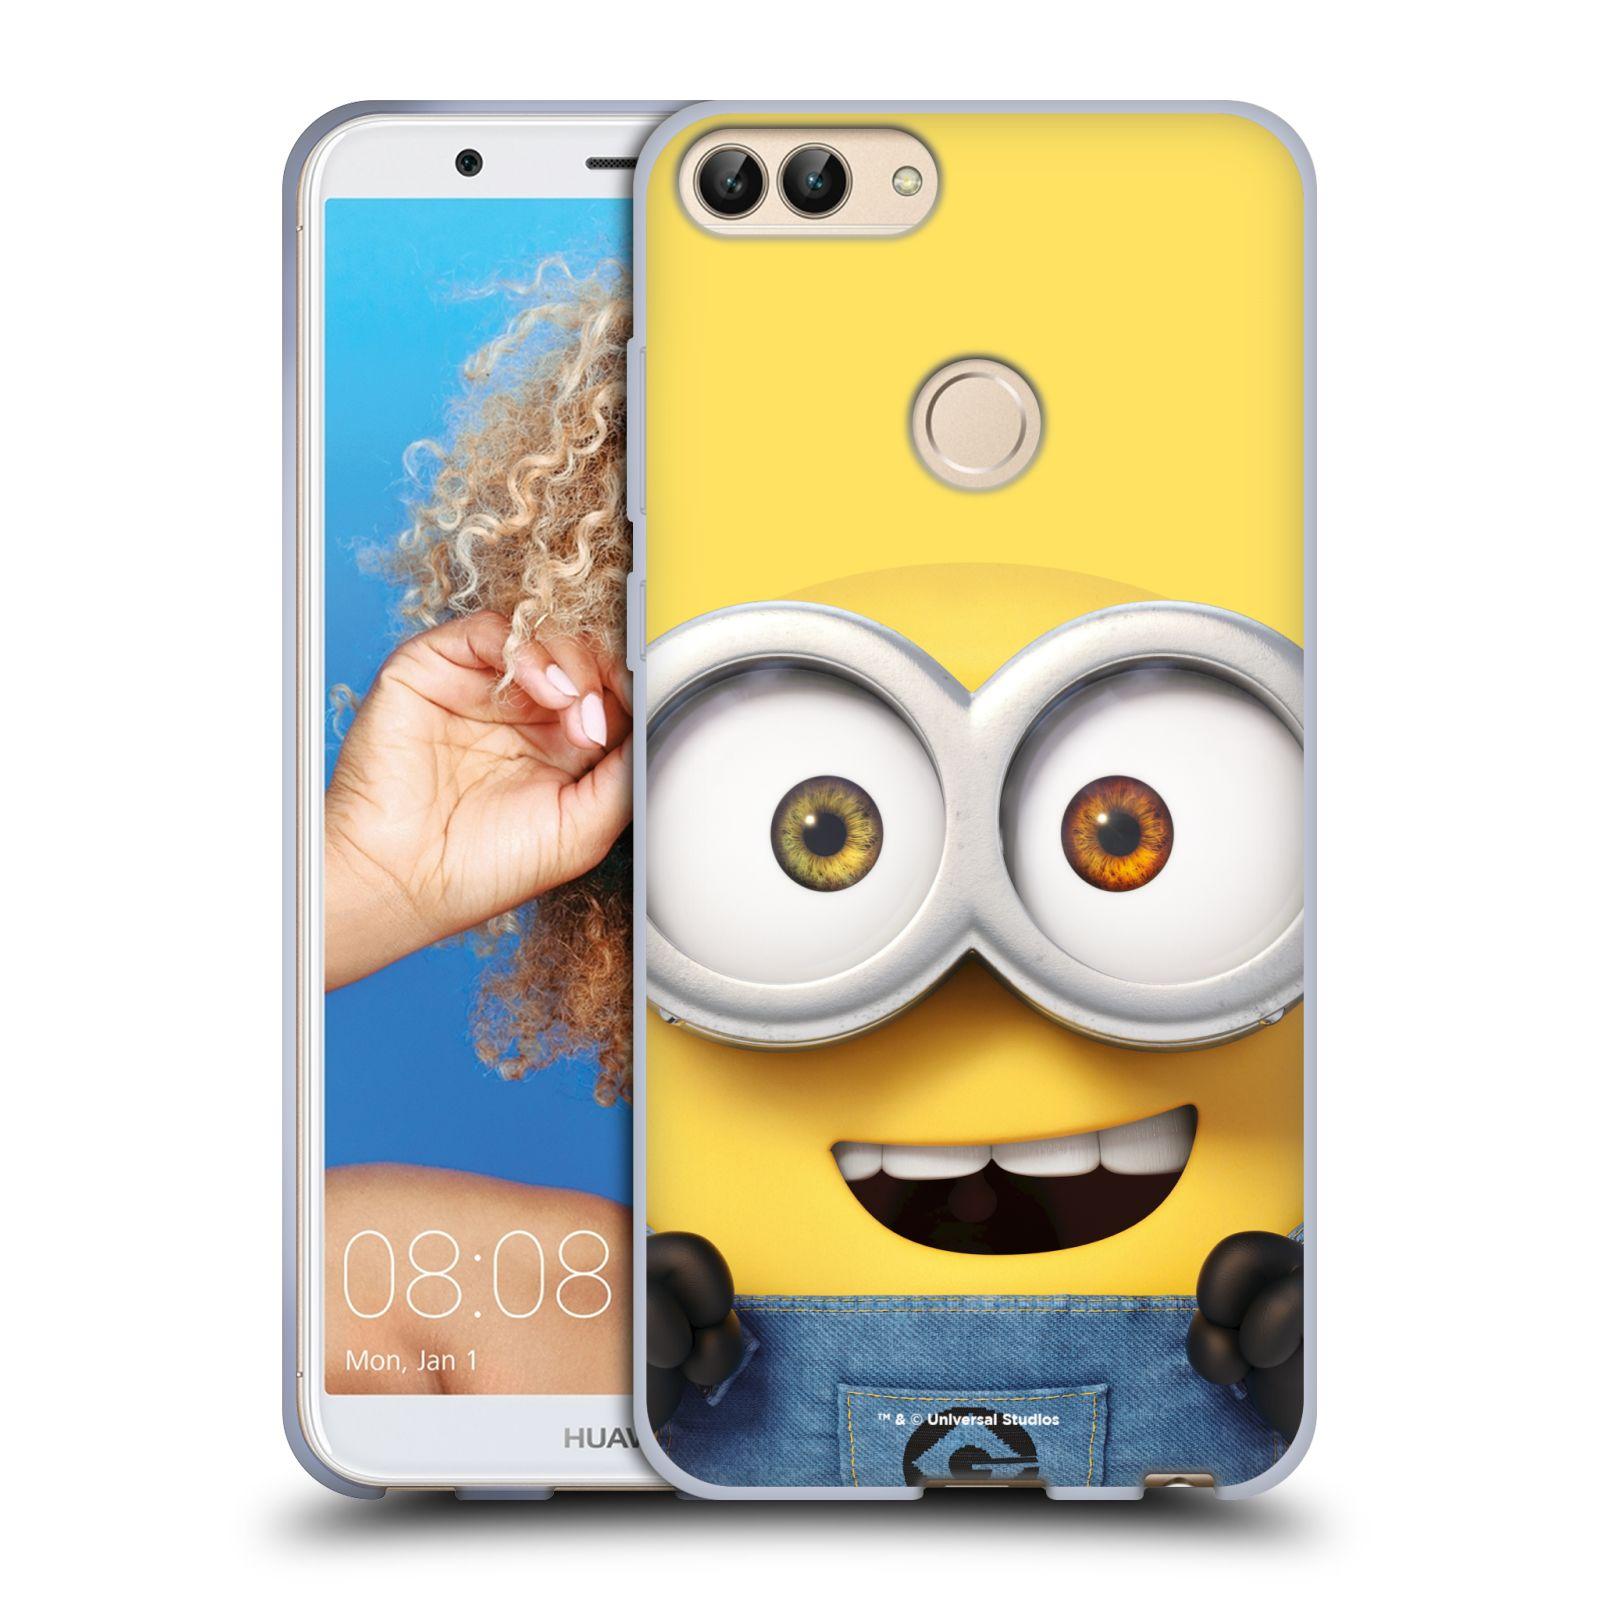 Silikonové pouzdro na mobil Huawei P Smart - Head Case - Mimoň Bob z filmu Já, padouch - Despicable Me